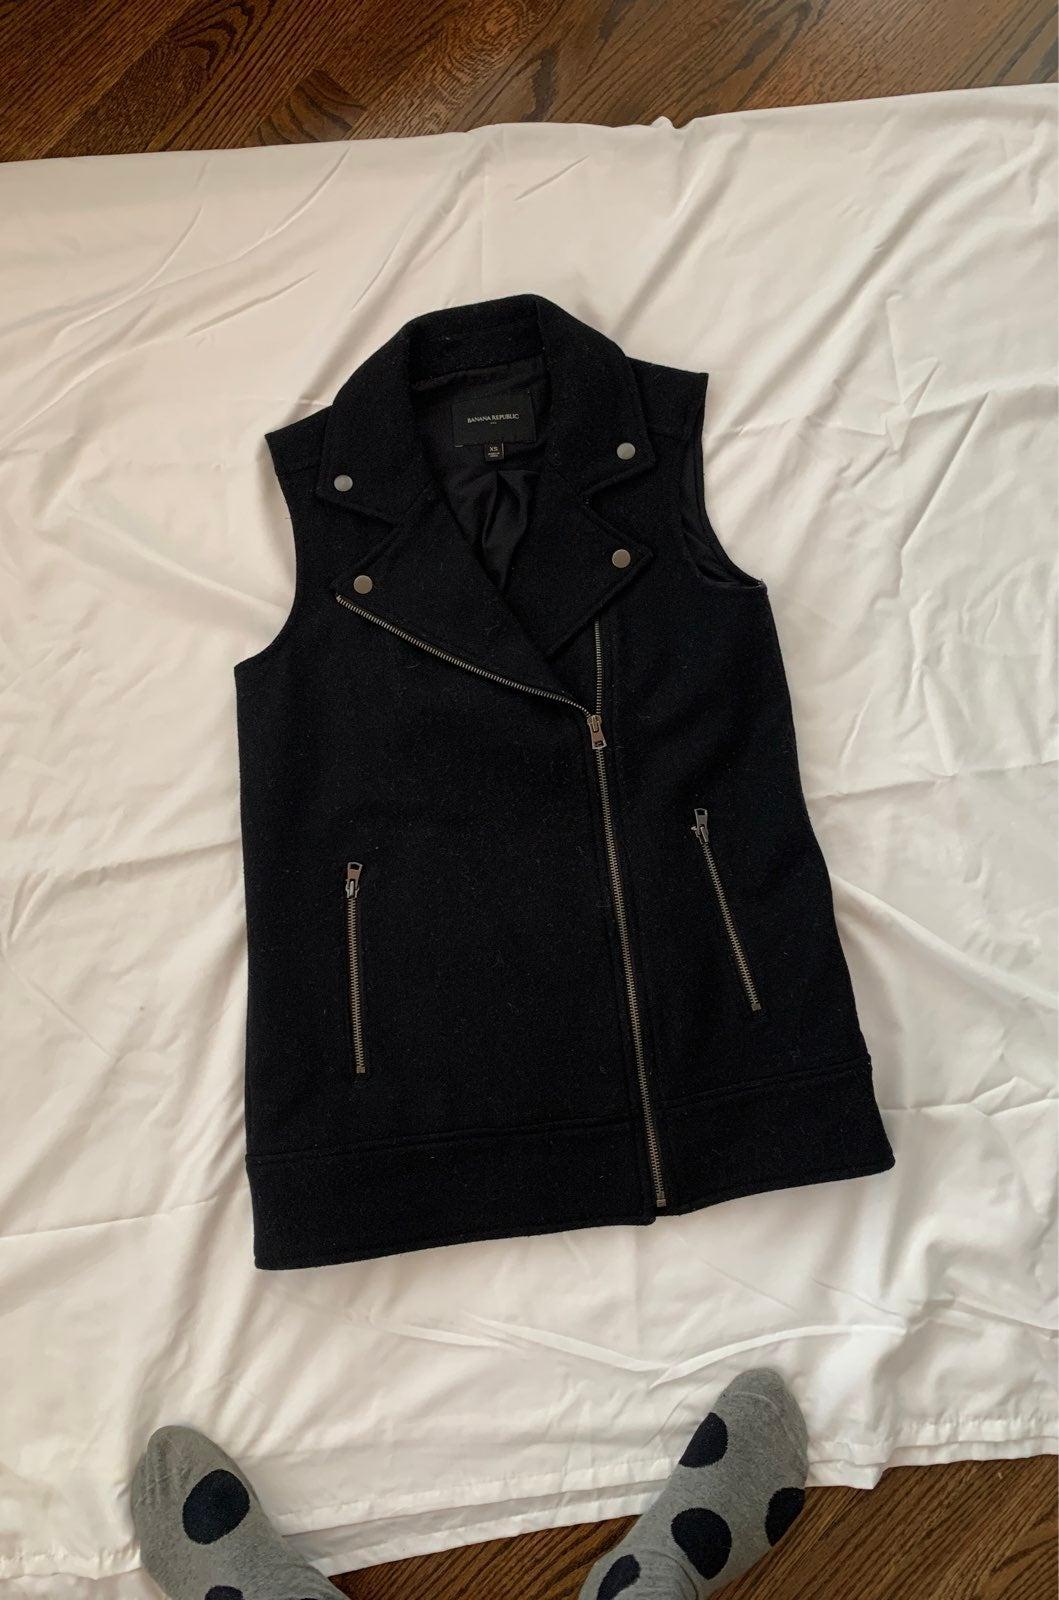 Banana Republic XS black wool zip up ves